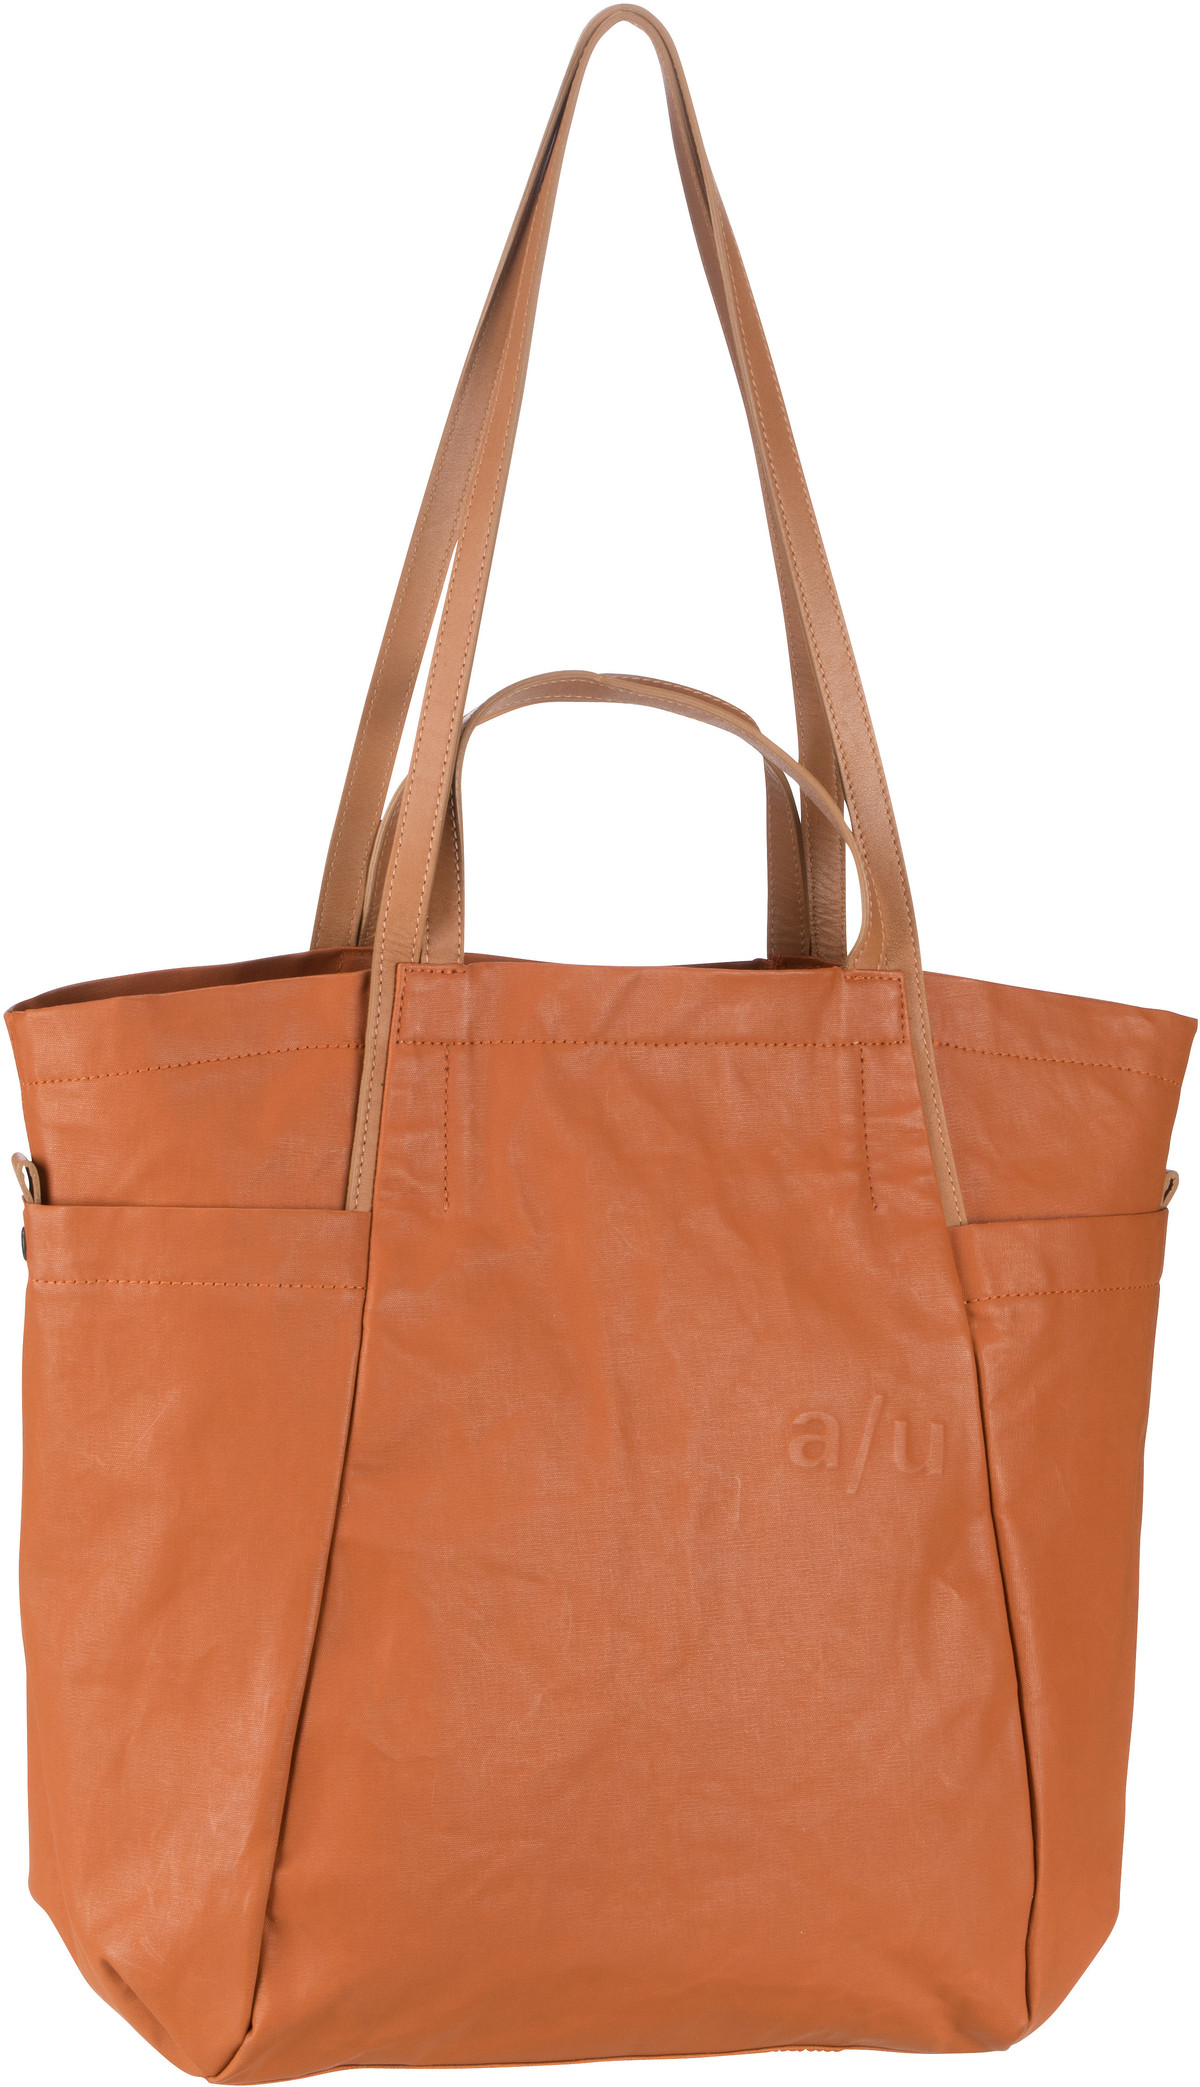 aunts & uncles -  Handtasche Takamatsu Glazed Ginger